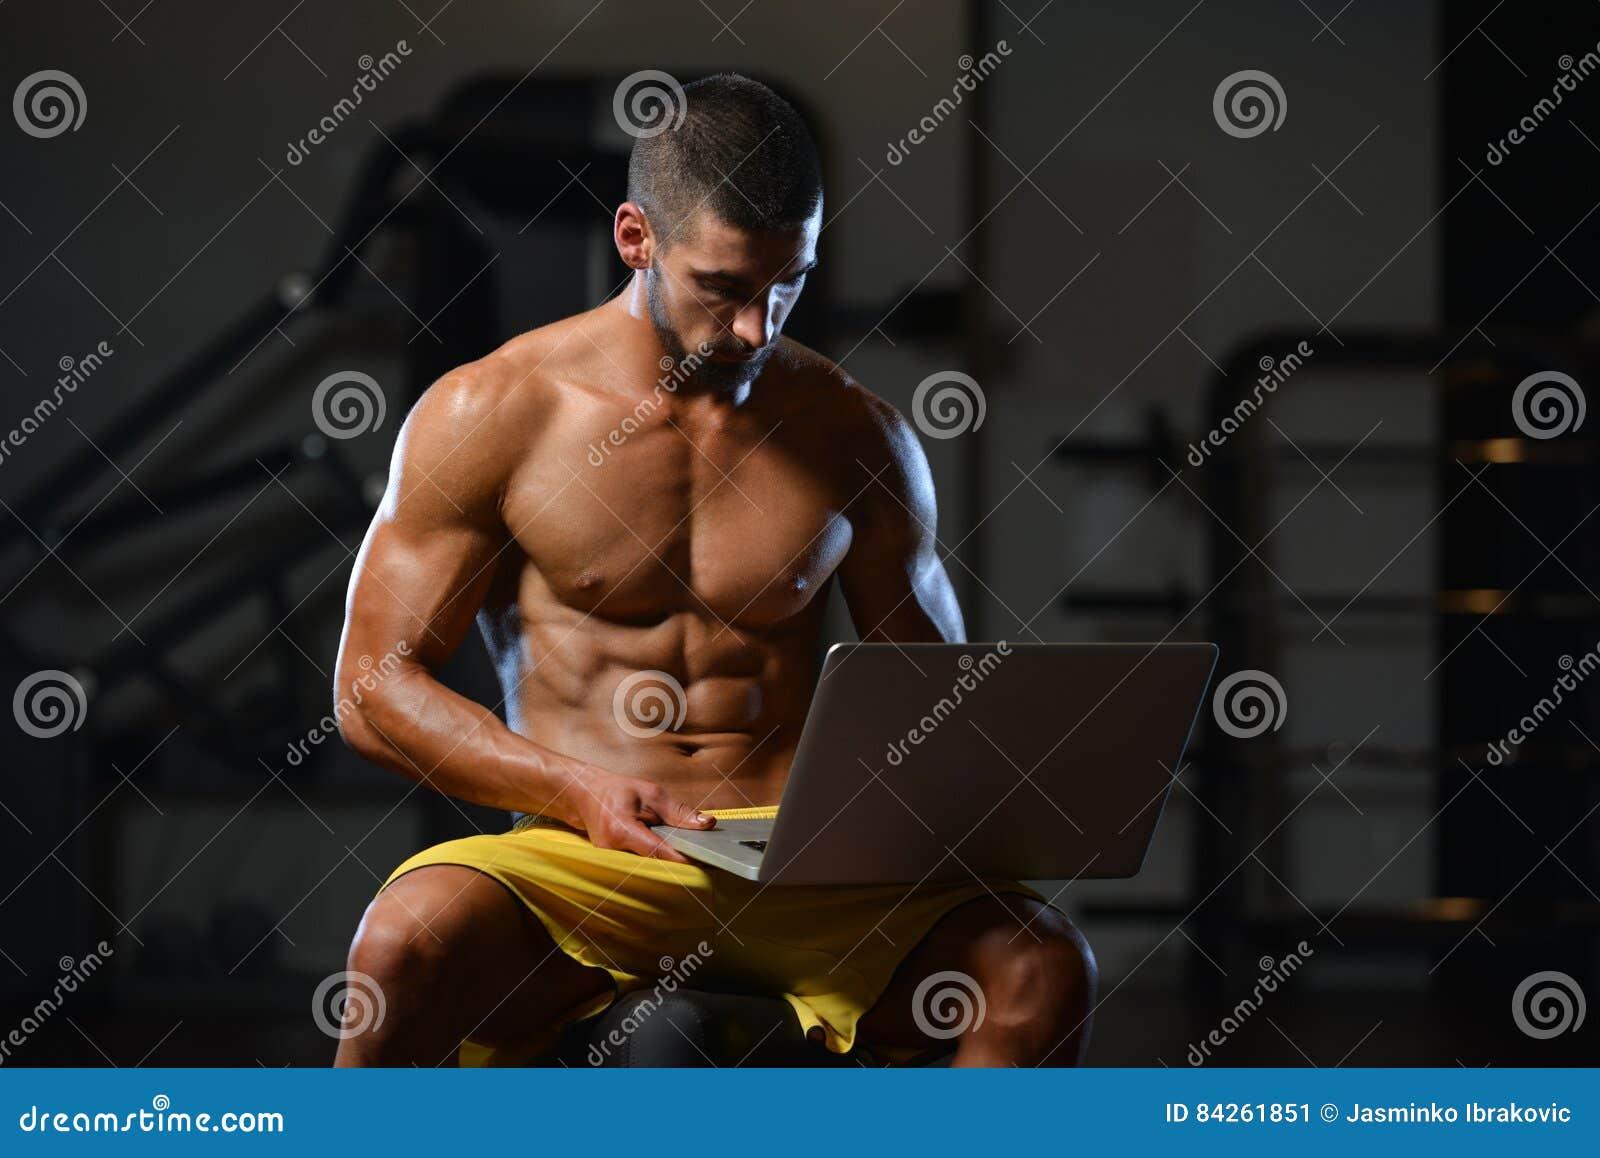 Spier Atletische Bodybuildergeschiktheid Modeluse computer